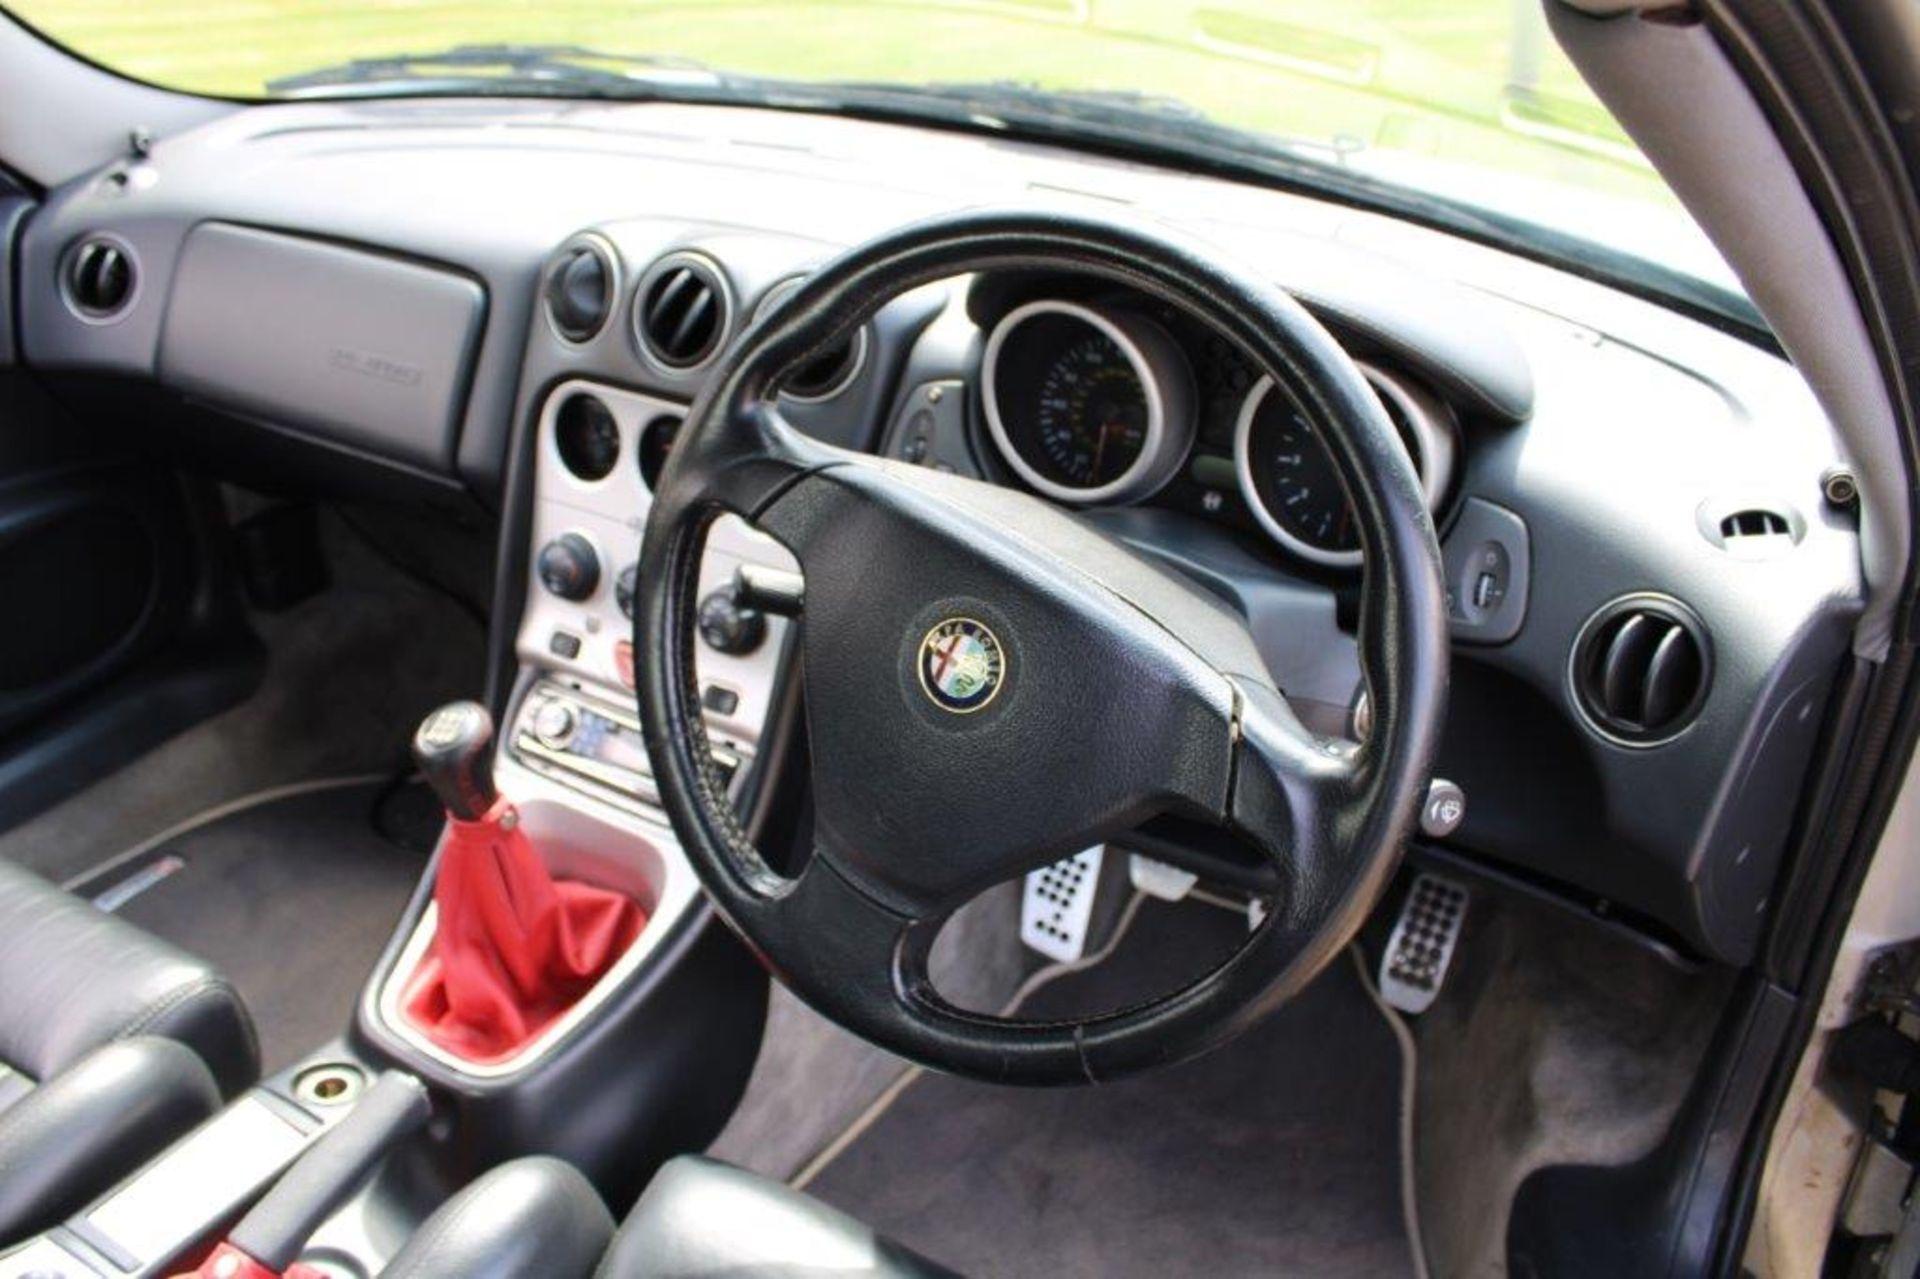 1999 Alfa Romeo GTV Lusso T-Spark 16v - Image 14 of 18